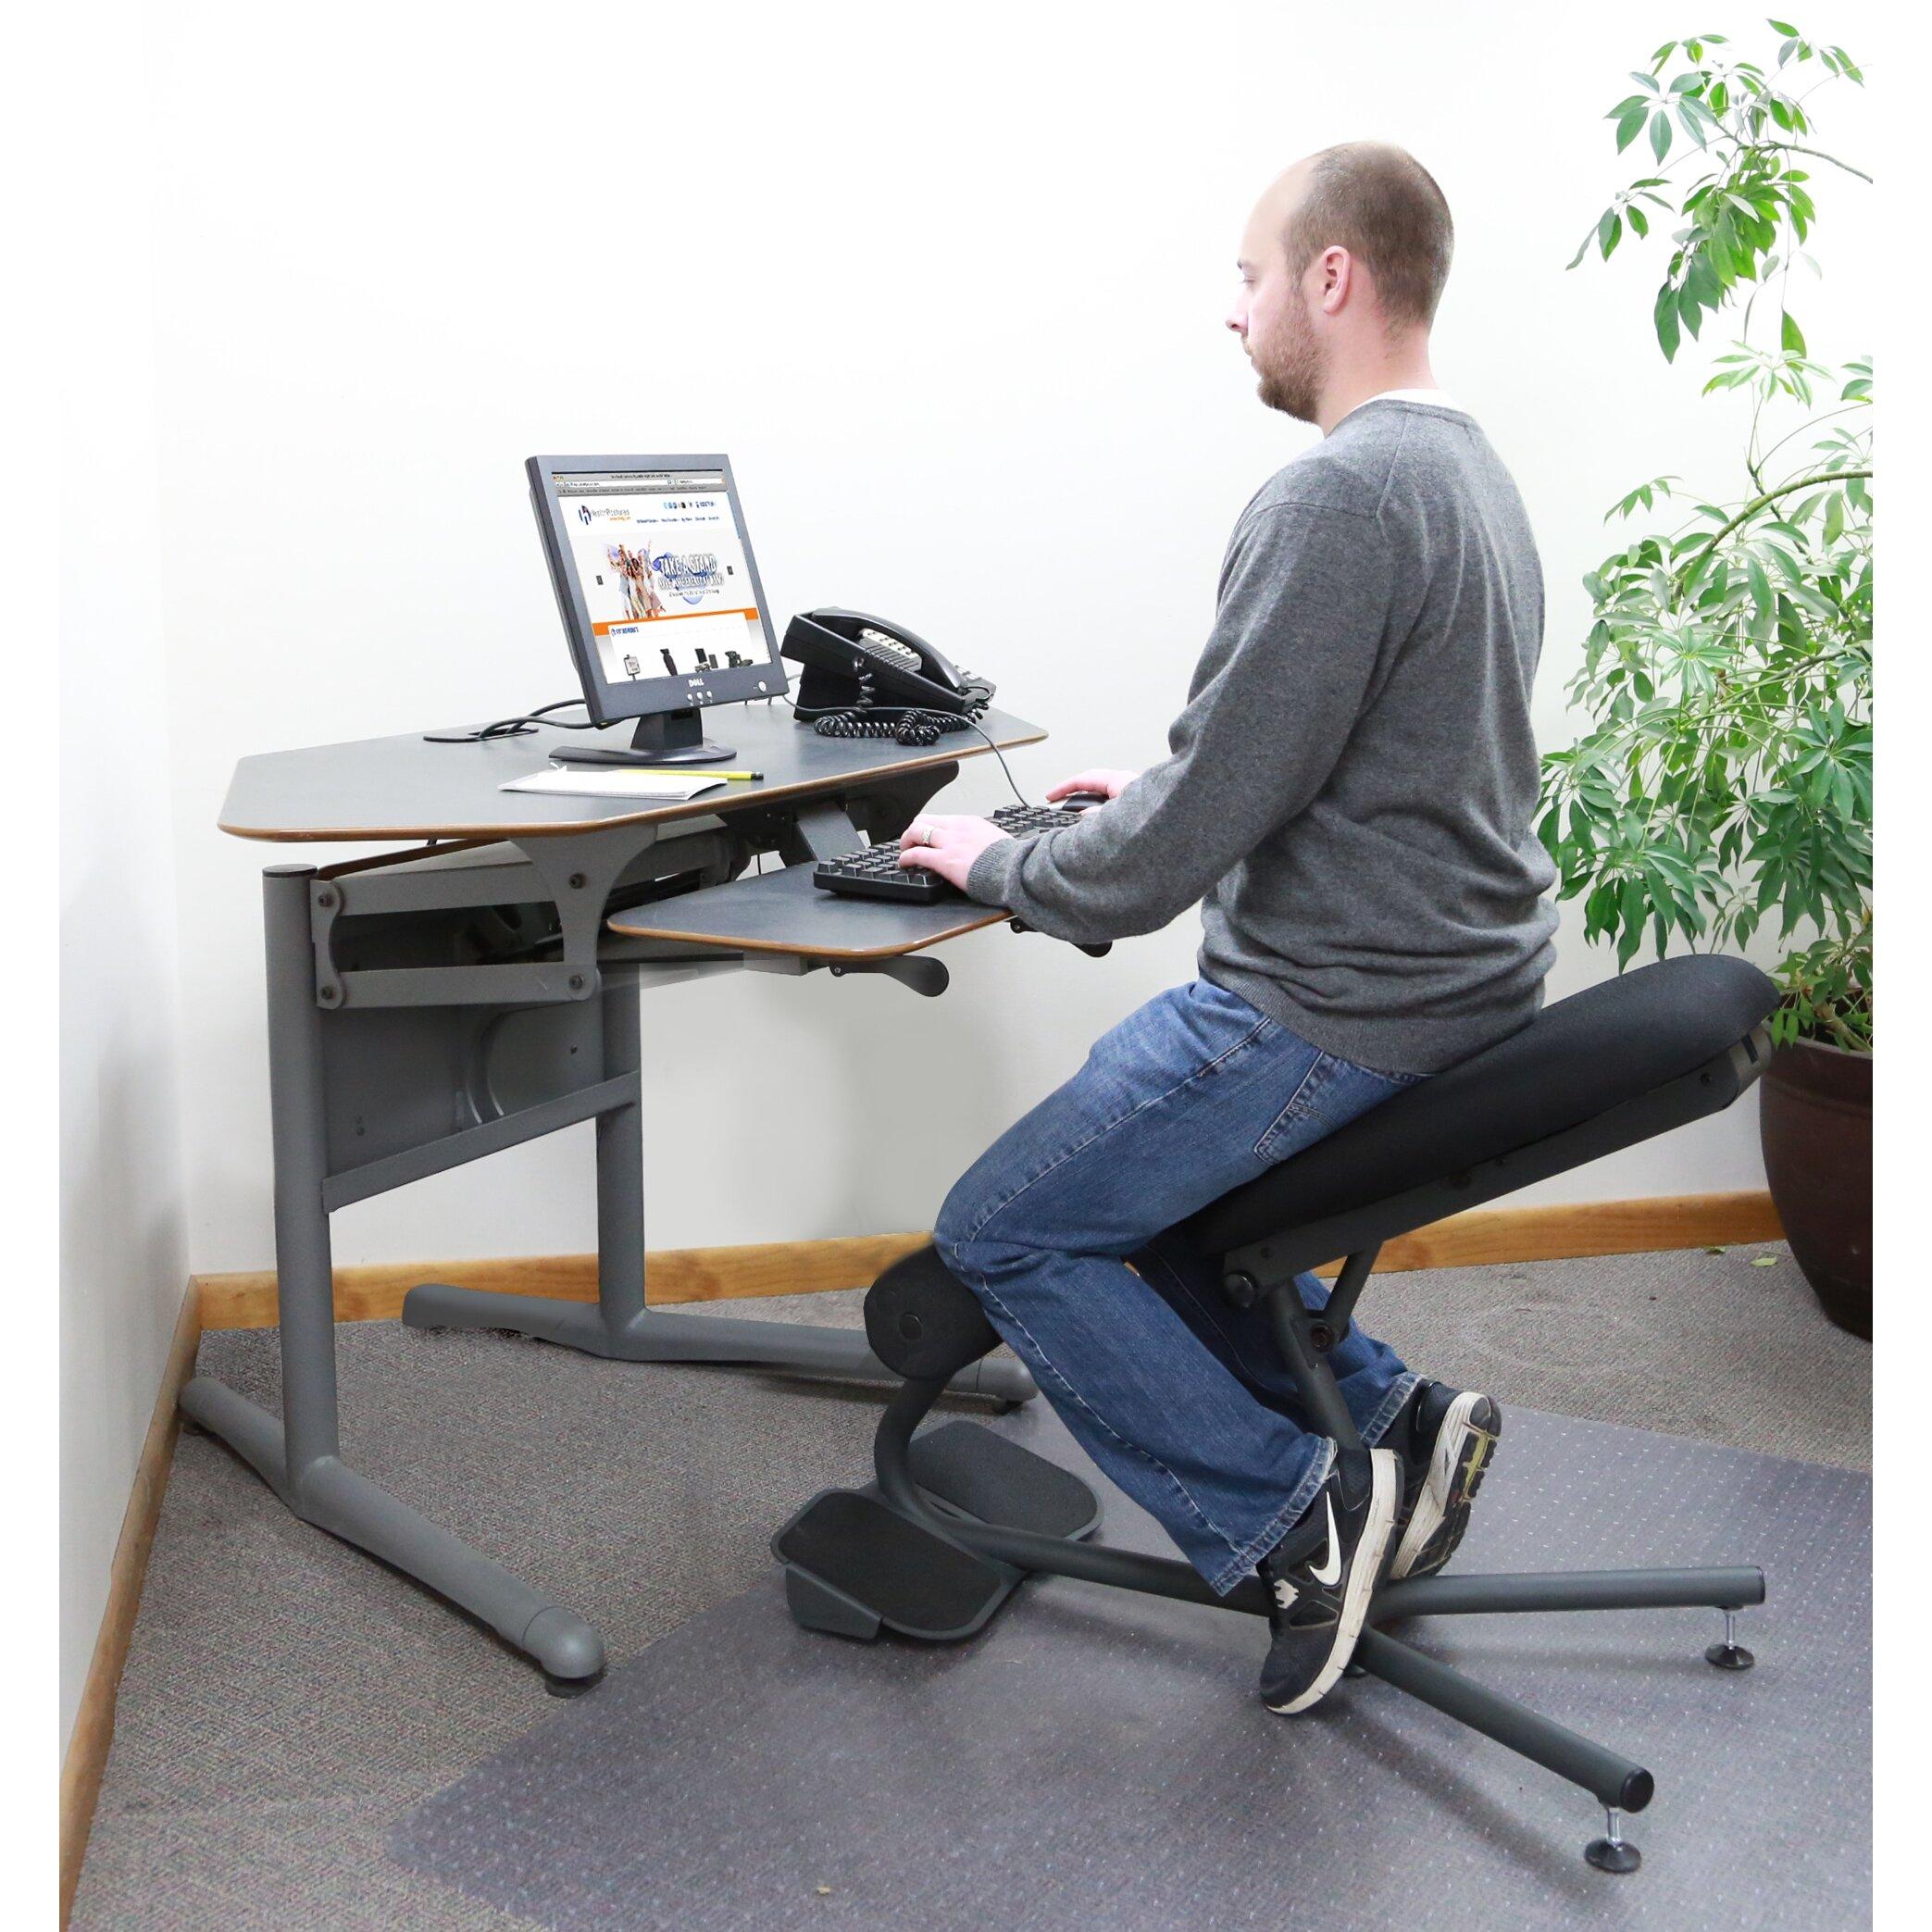 Health Posture Stance Move Kneeling Chair. Health Postures Stance Move Kneeling Chair   Reviews   Wayfair